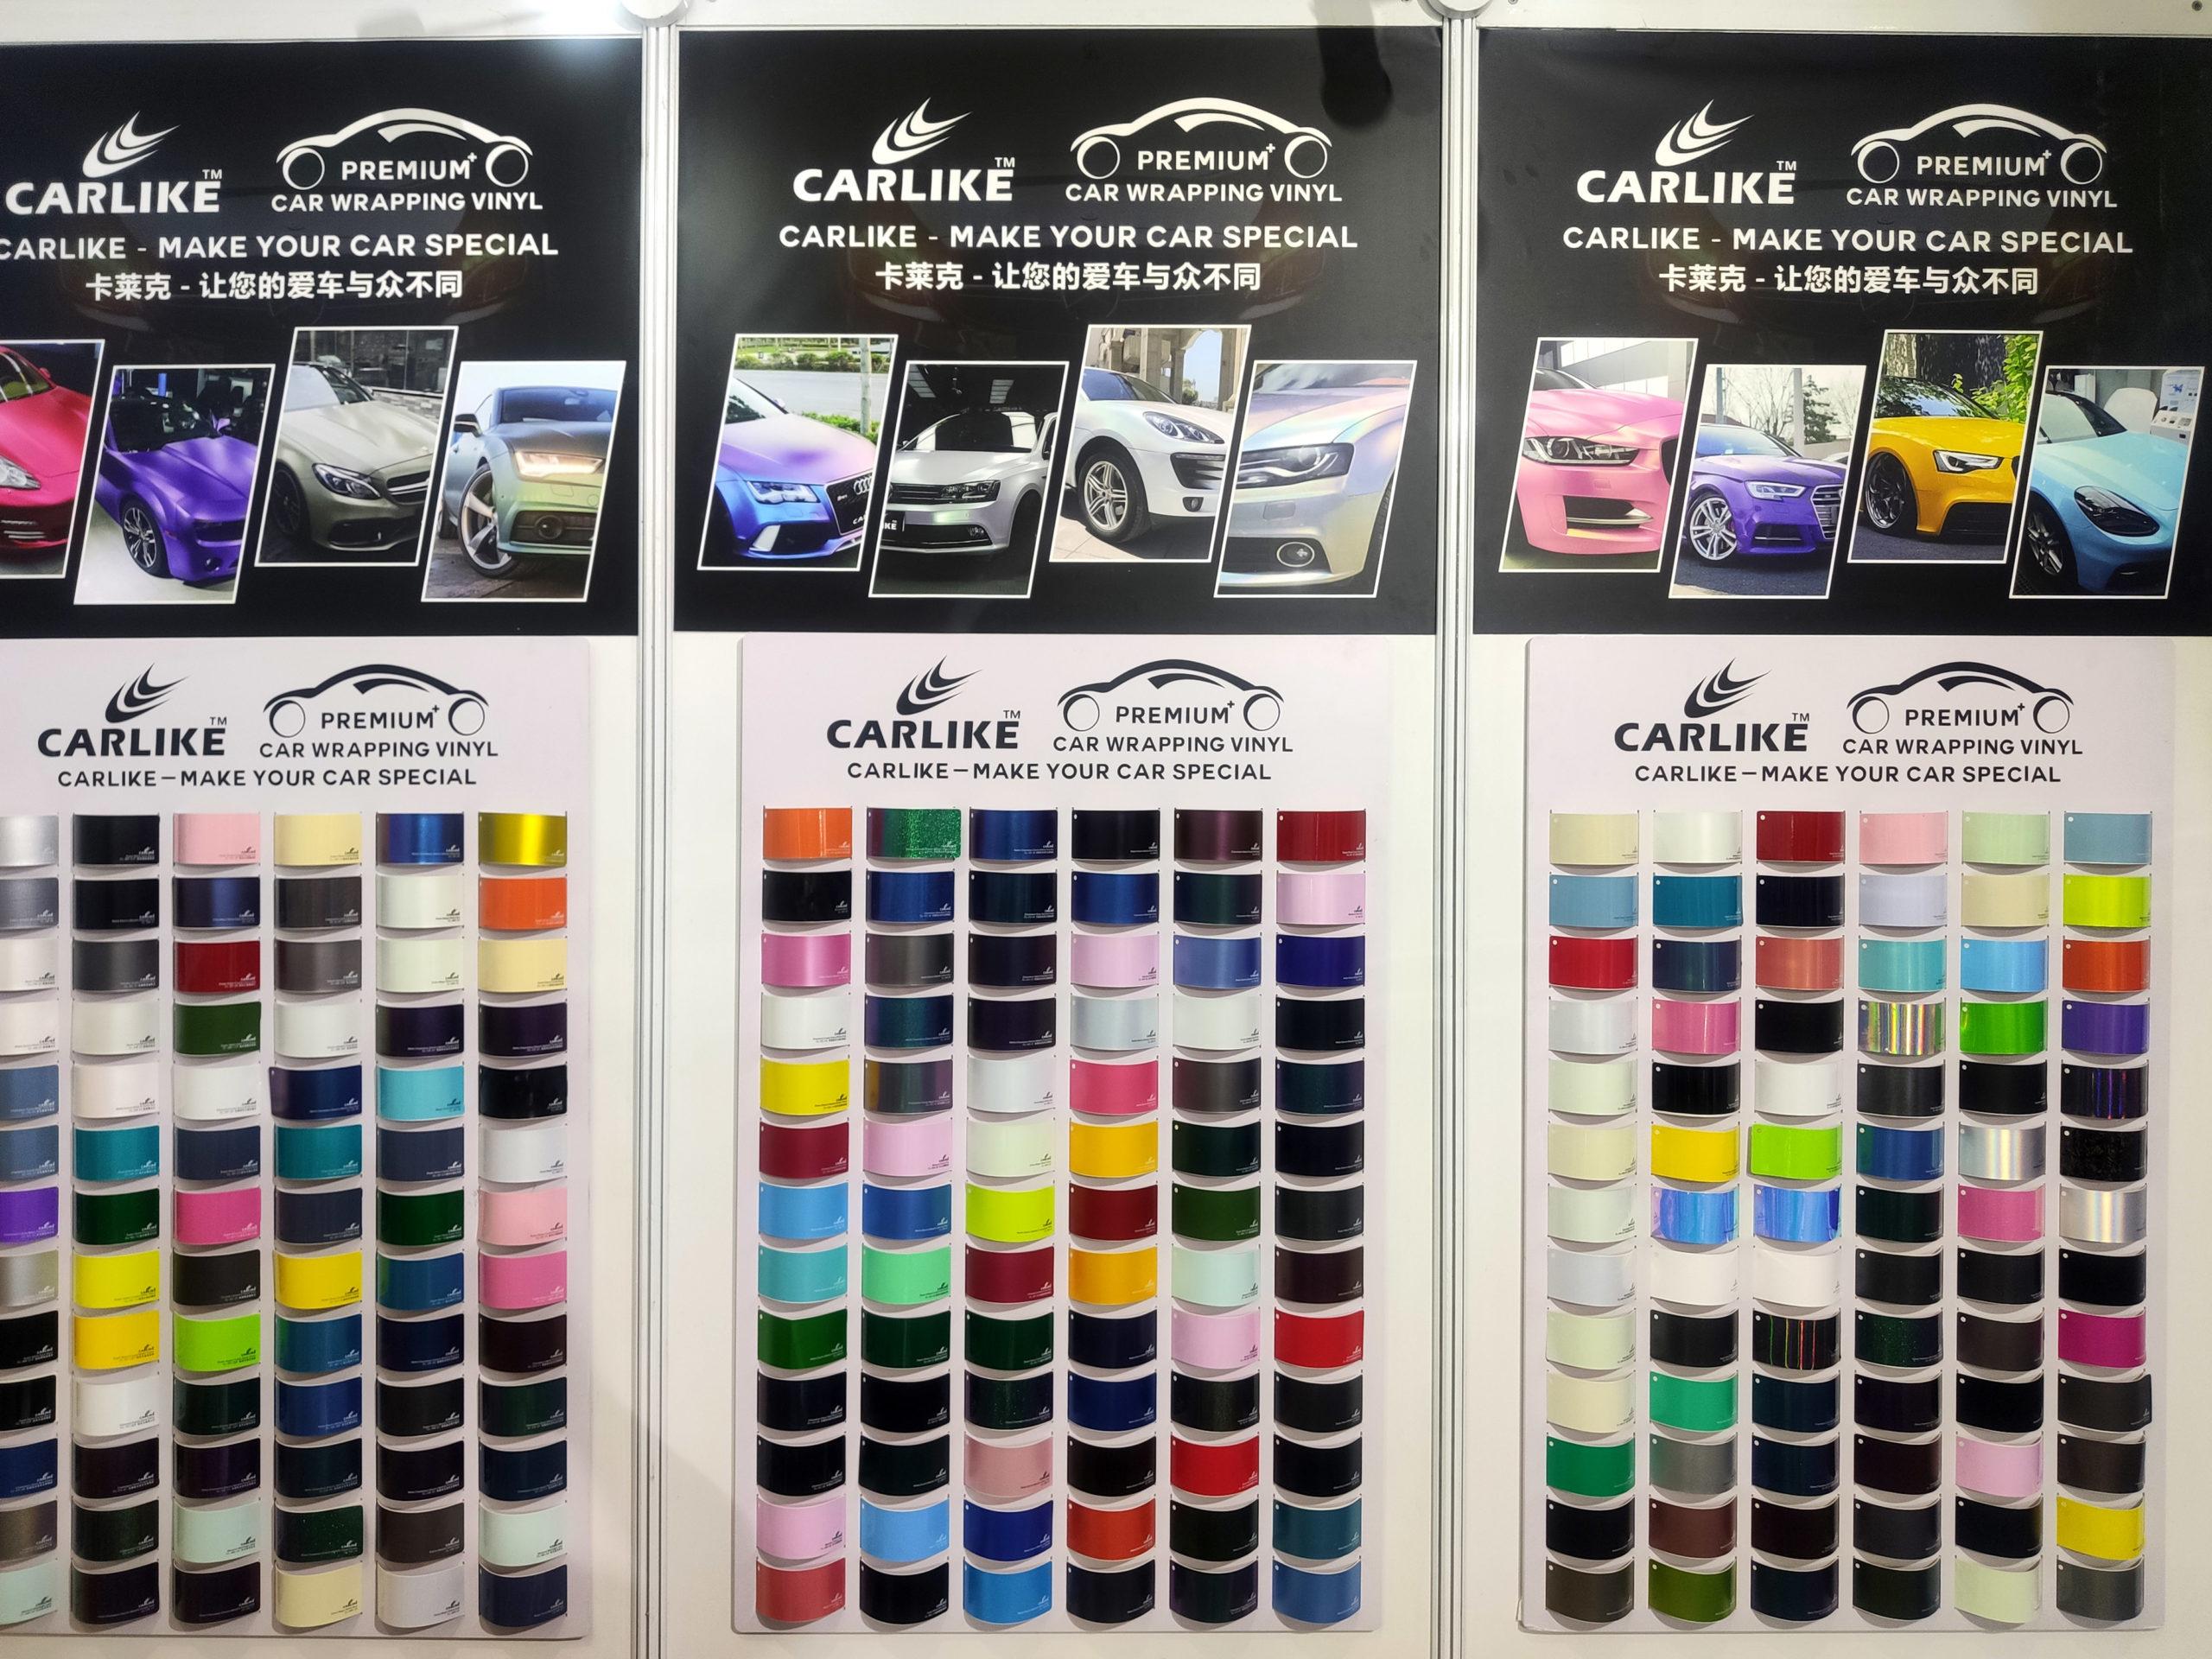 2021 SINO GROUP APPPEXPO SHANGHAI Show Main Product: DIY Craft Vinyl, Car Wrap Vinyl, Cutting Vinyl